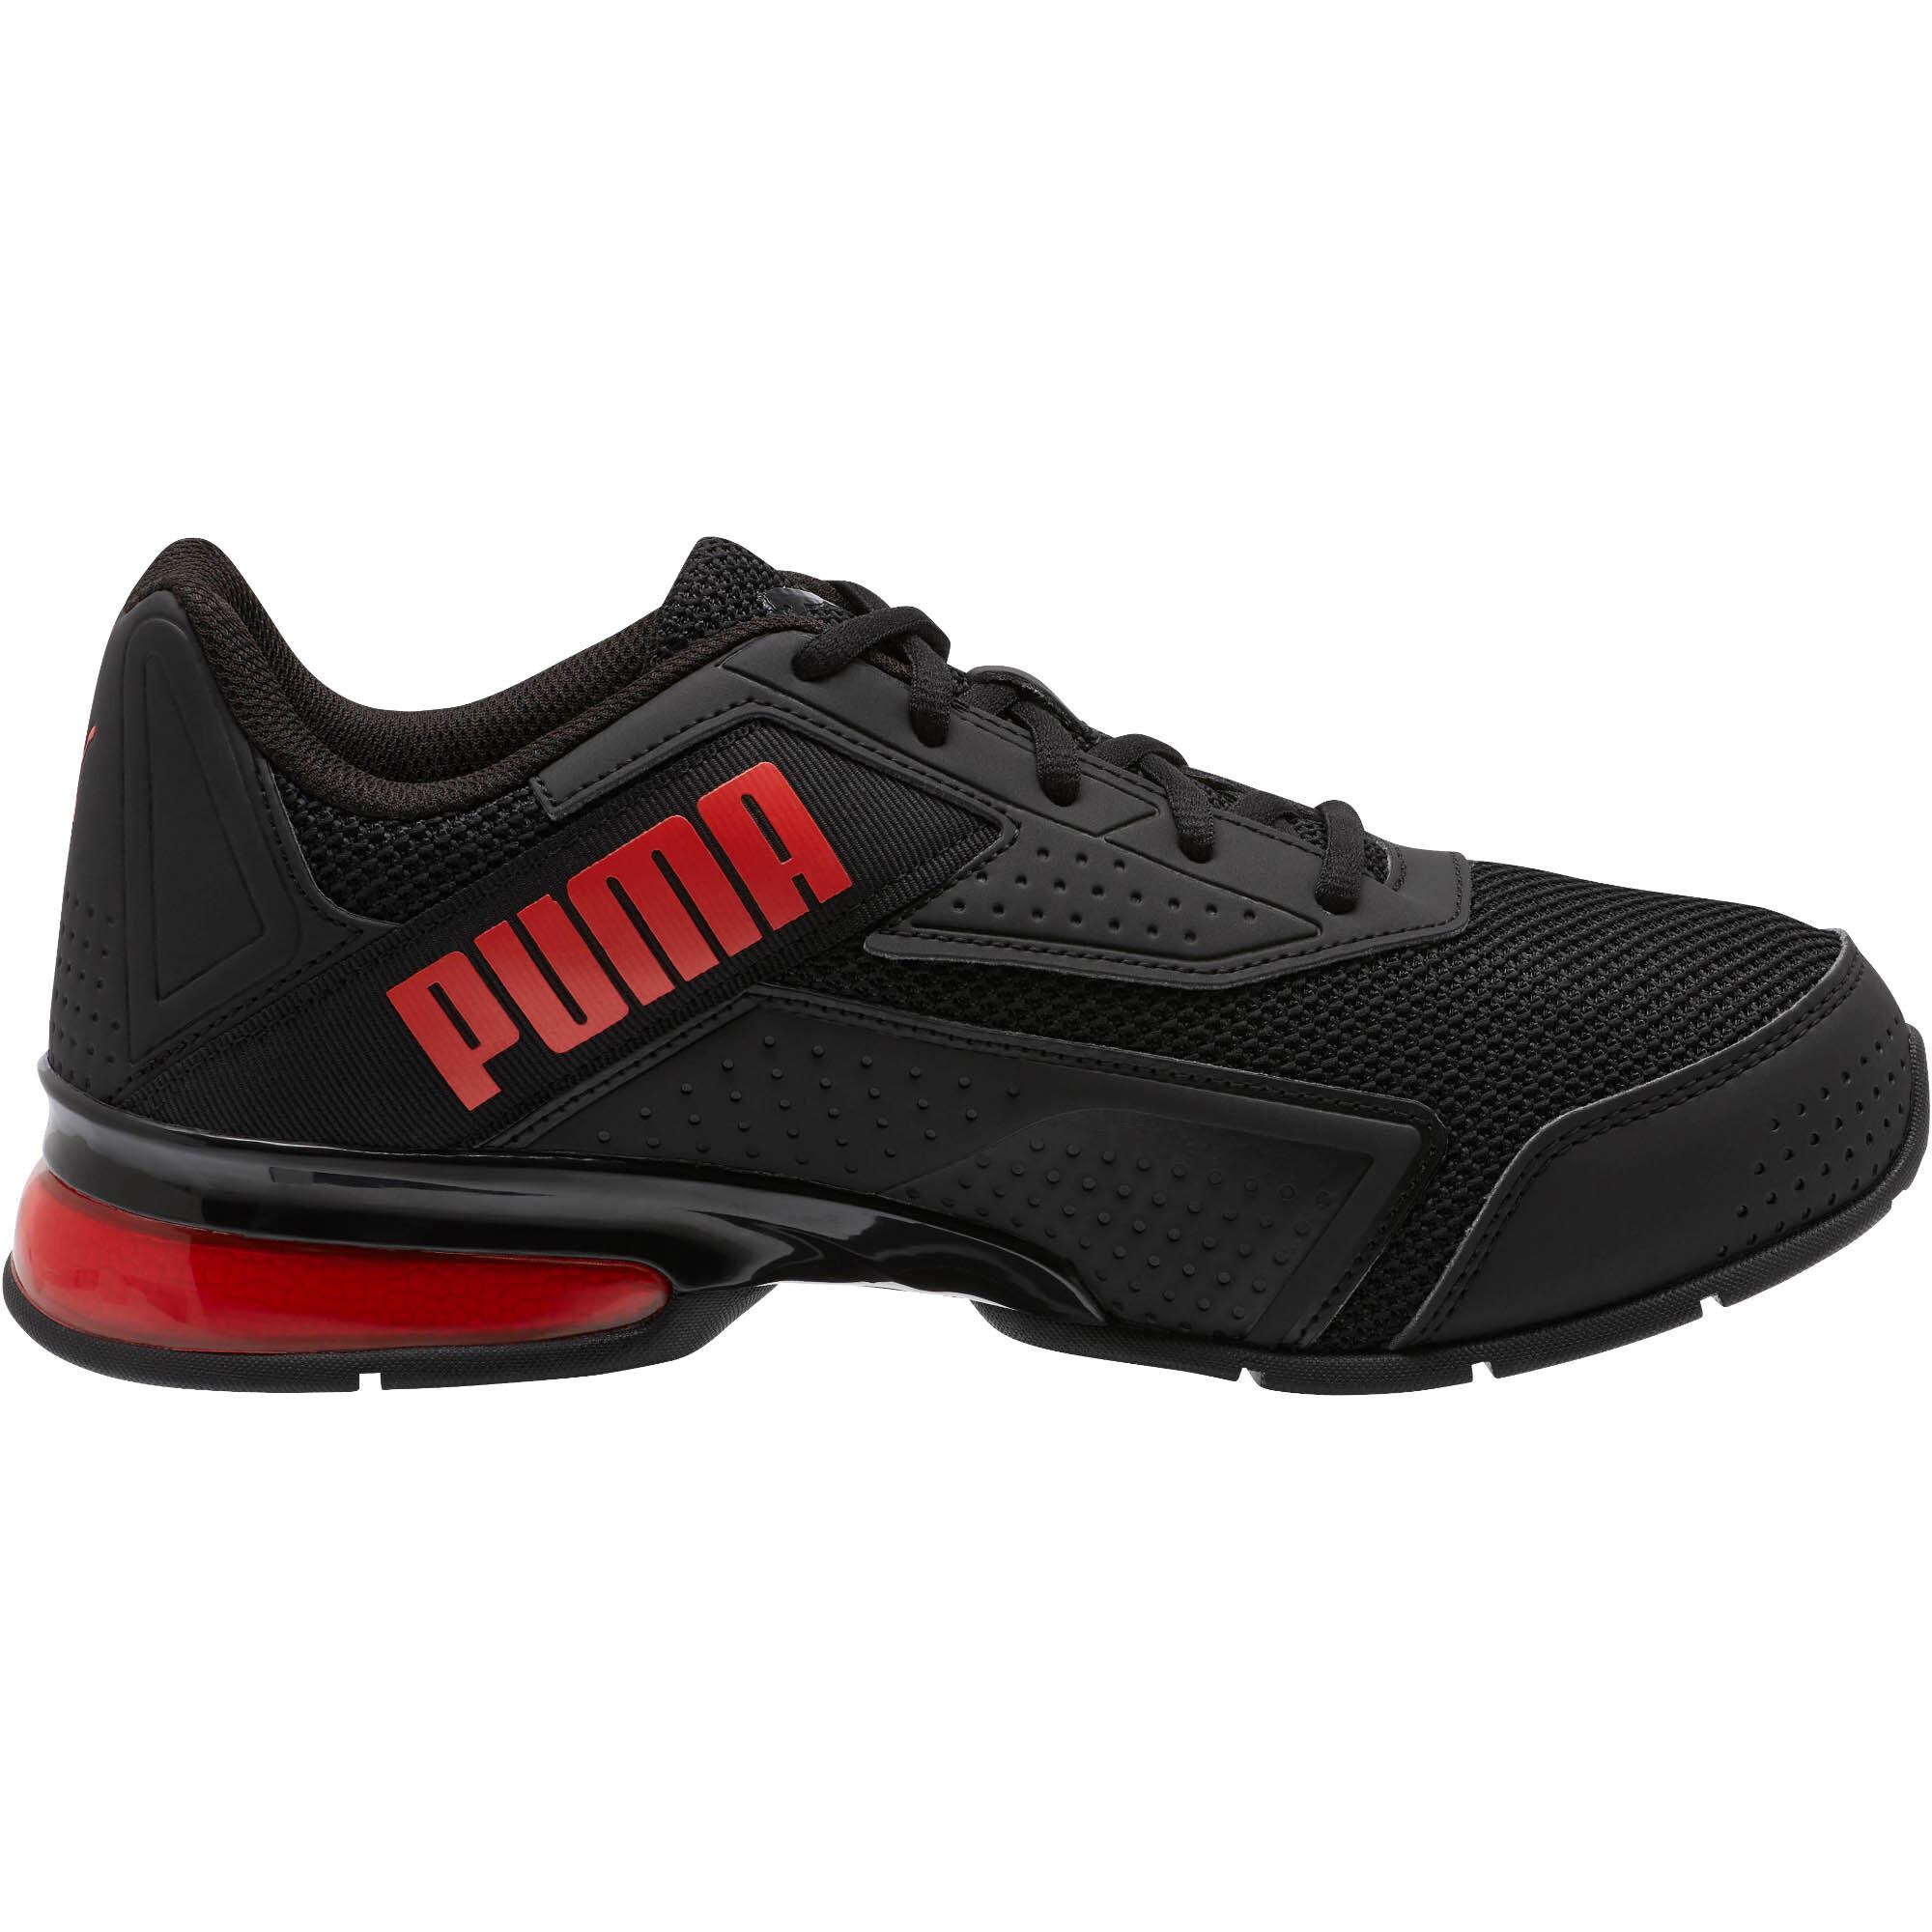 PUMA-Leader-VT-Bold-Men-039-s-Training-Shoes-Men-Shoe-Running thumbnail 15